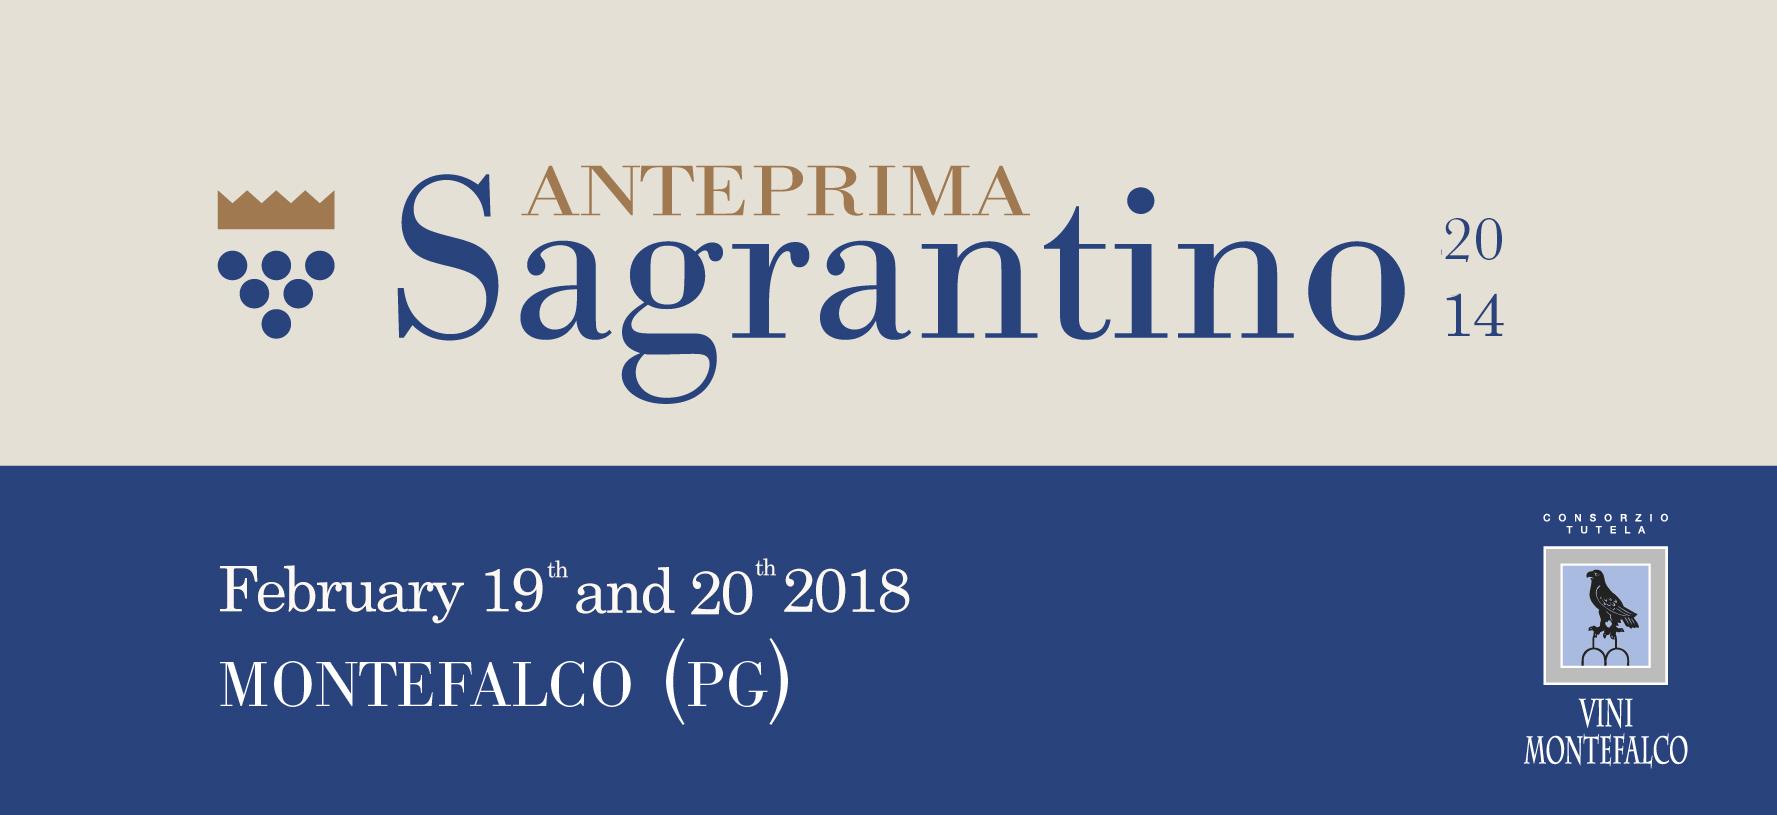 Anteprima Sagrantino appuntamento a febbraio